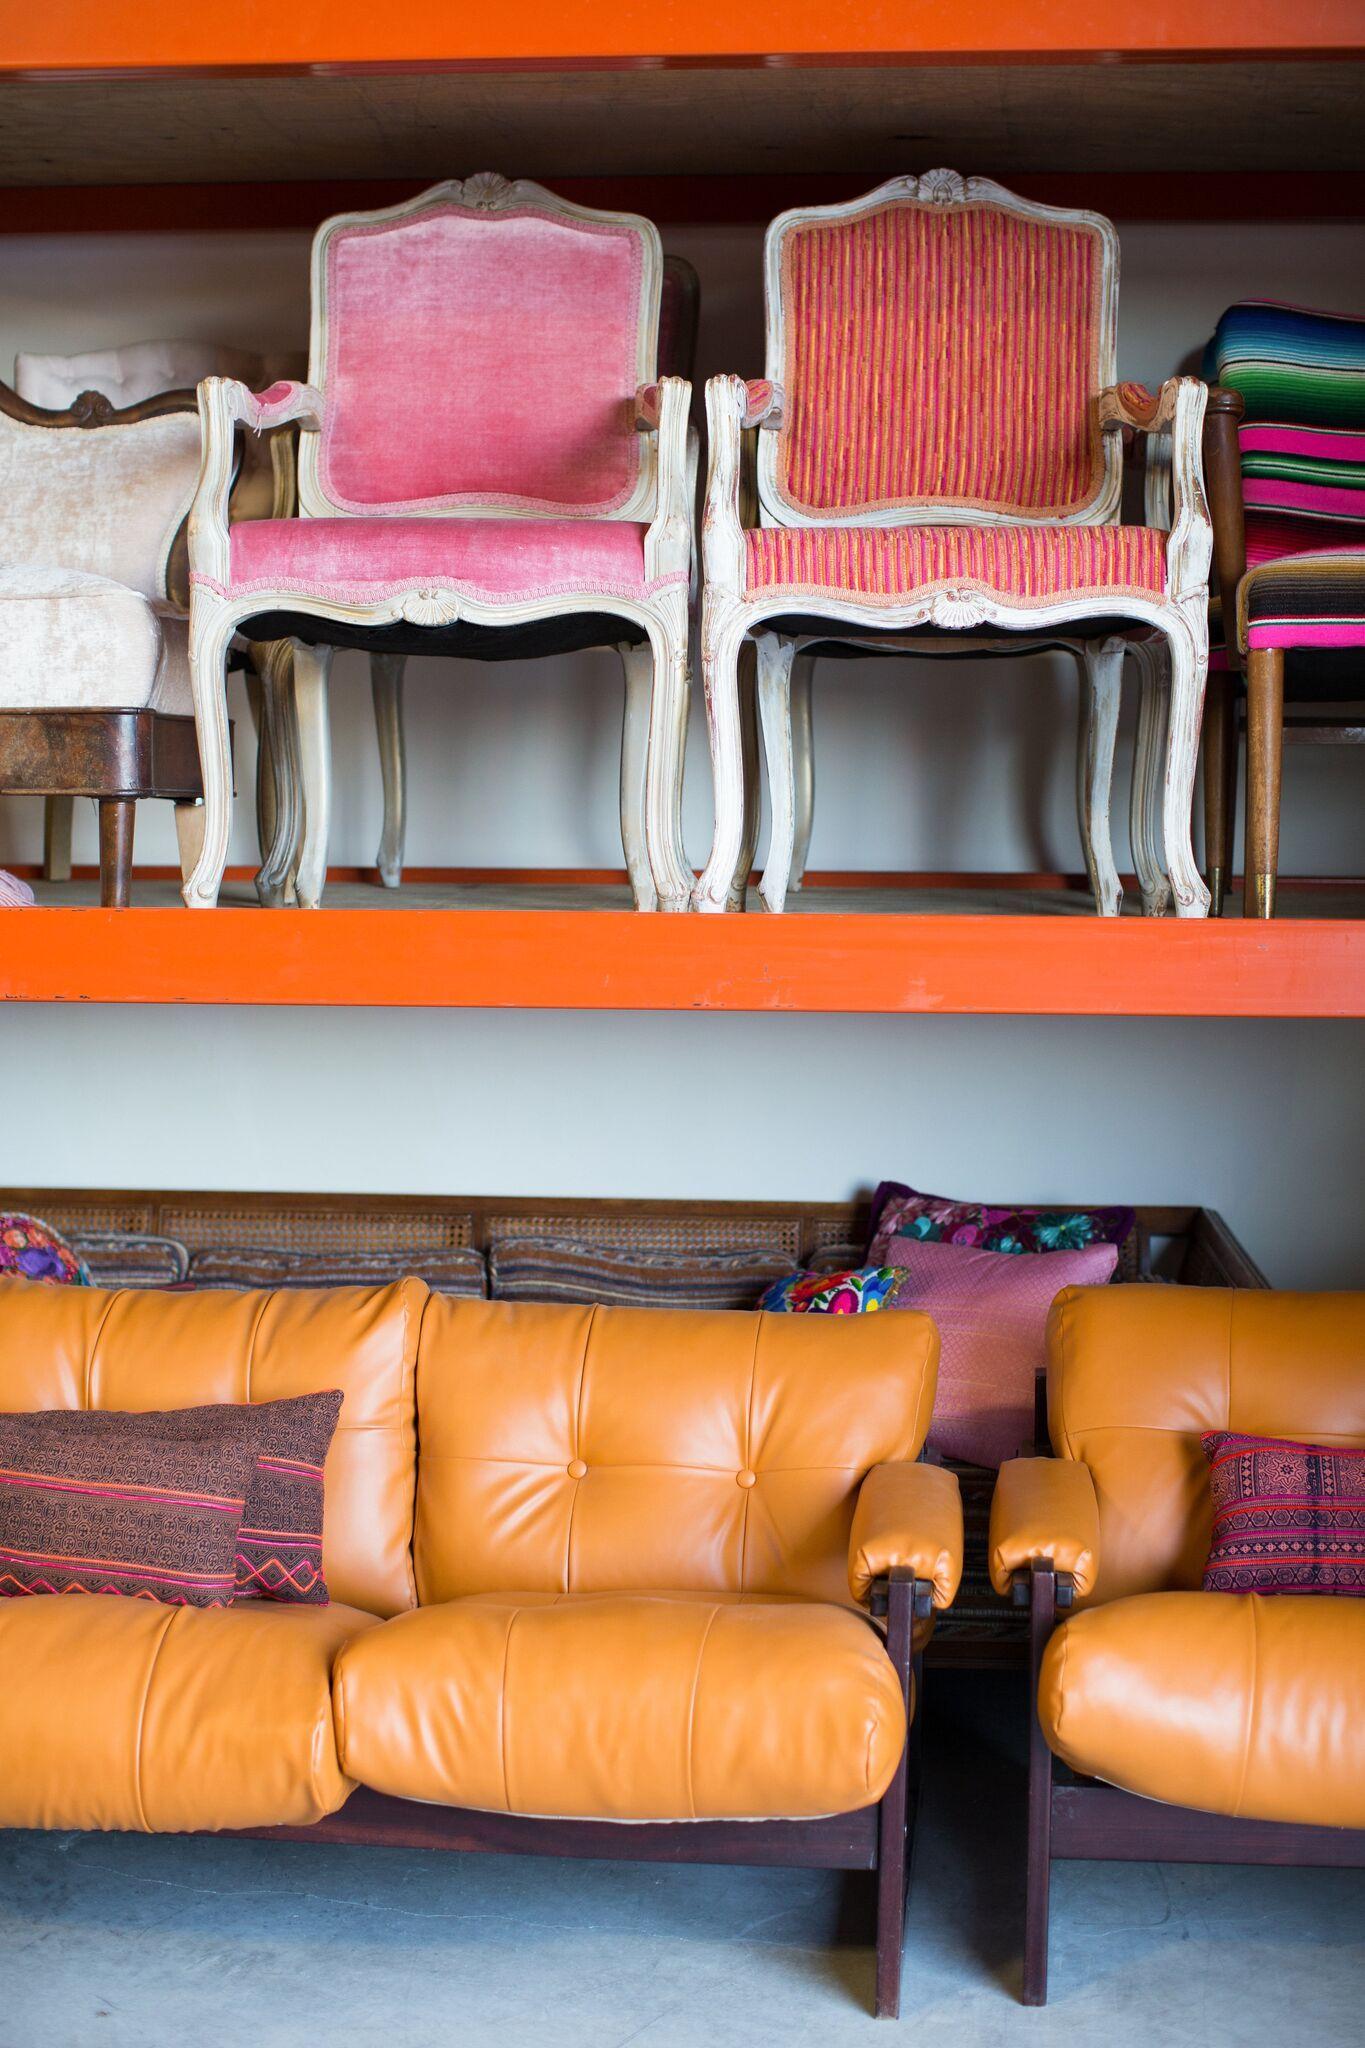 Wedding and event rental companys warehouse with vintage furniture in austin texas via birch brass vintage rentals